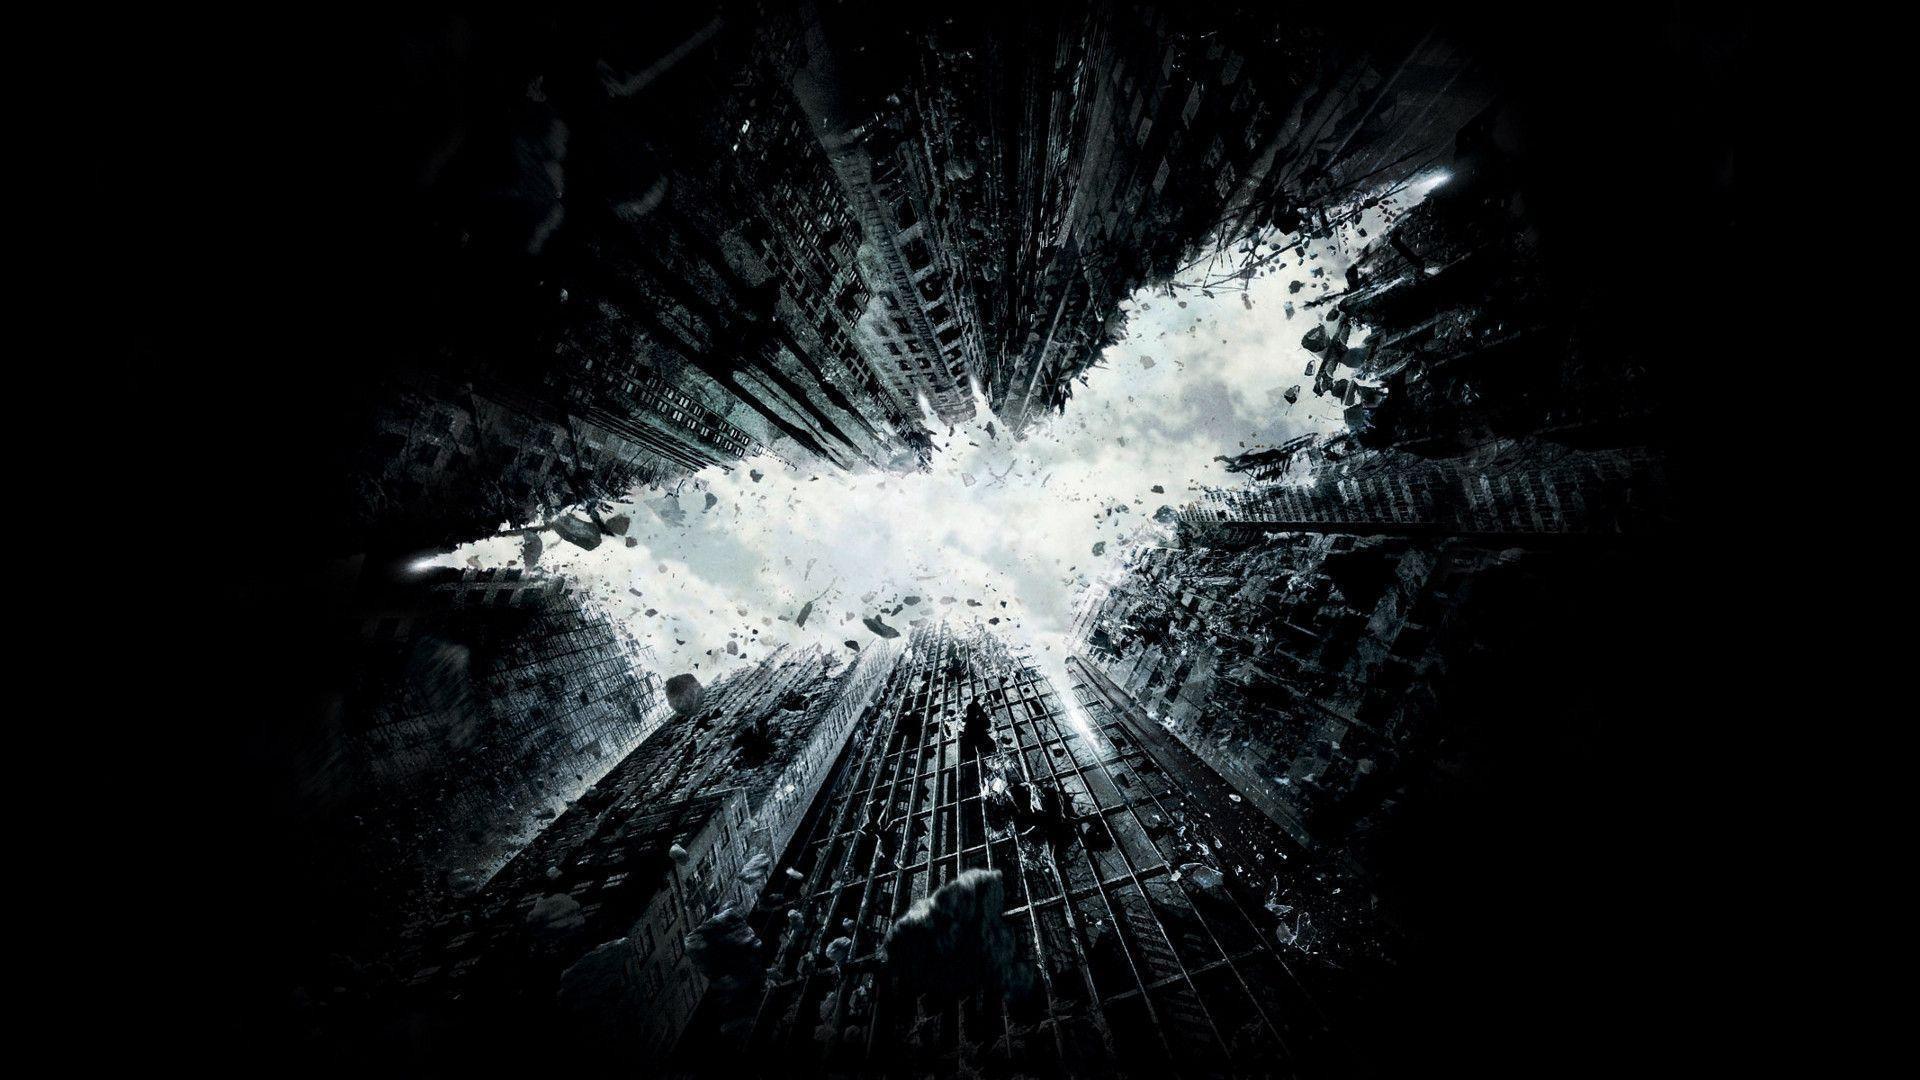 The Dark Knight Rises Wallpaper Hd 1920x1080 79 Images